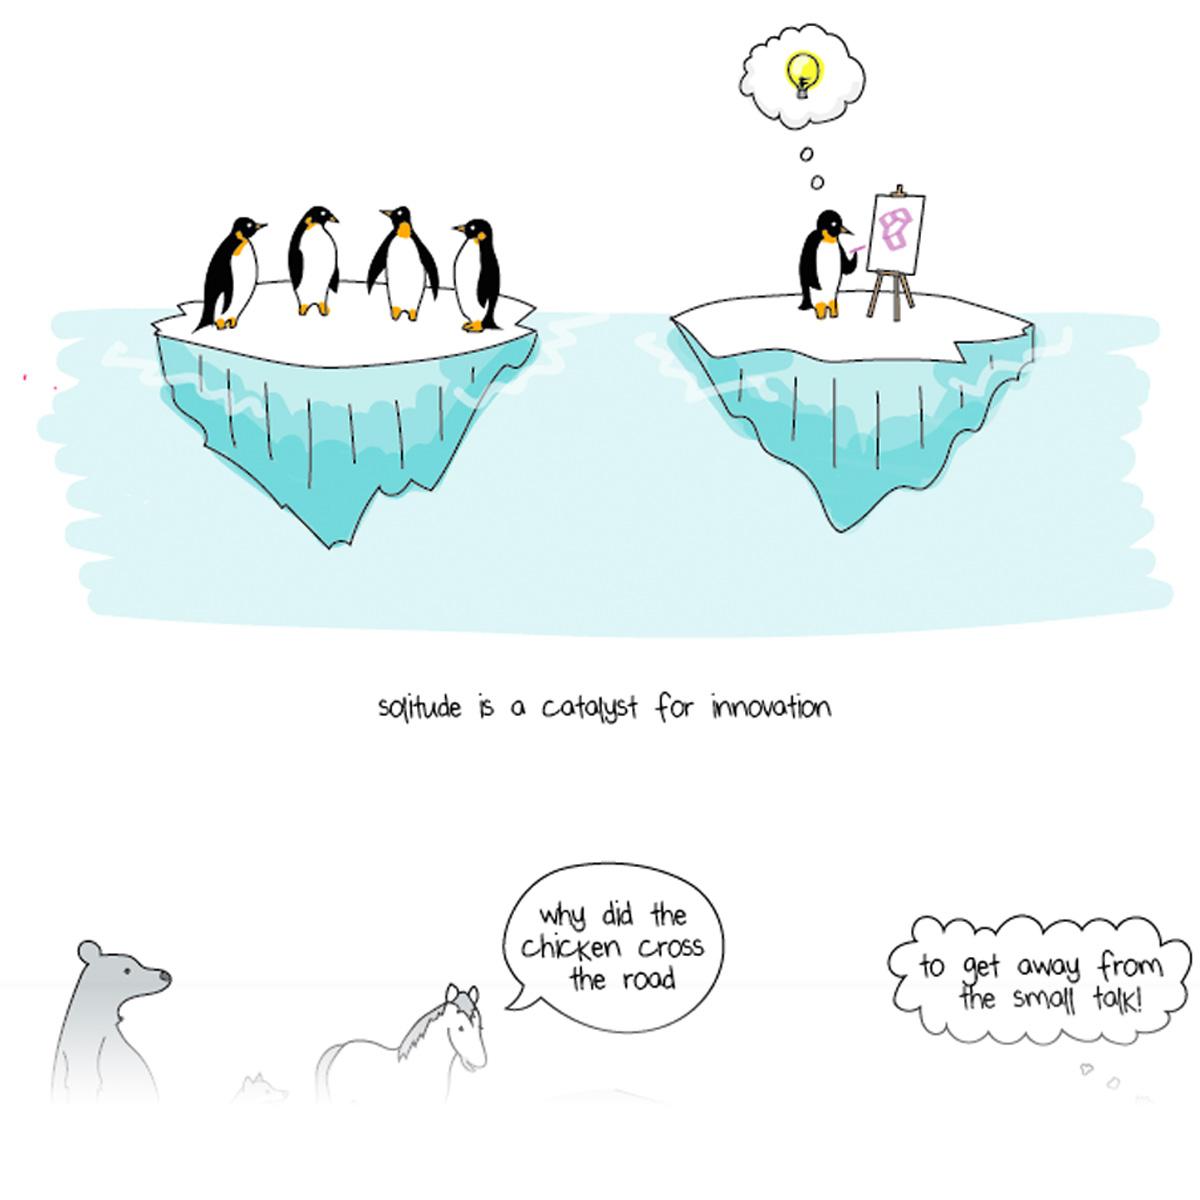 Sample Illustrations by Liz Fosslein